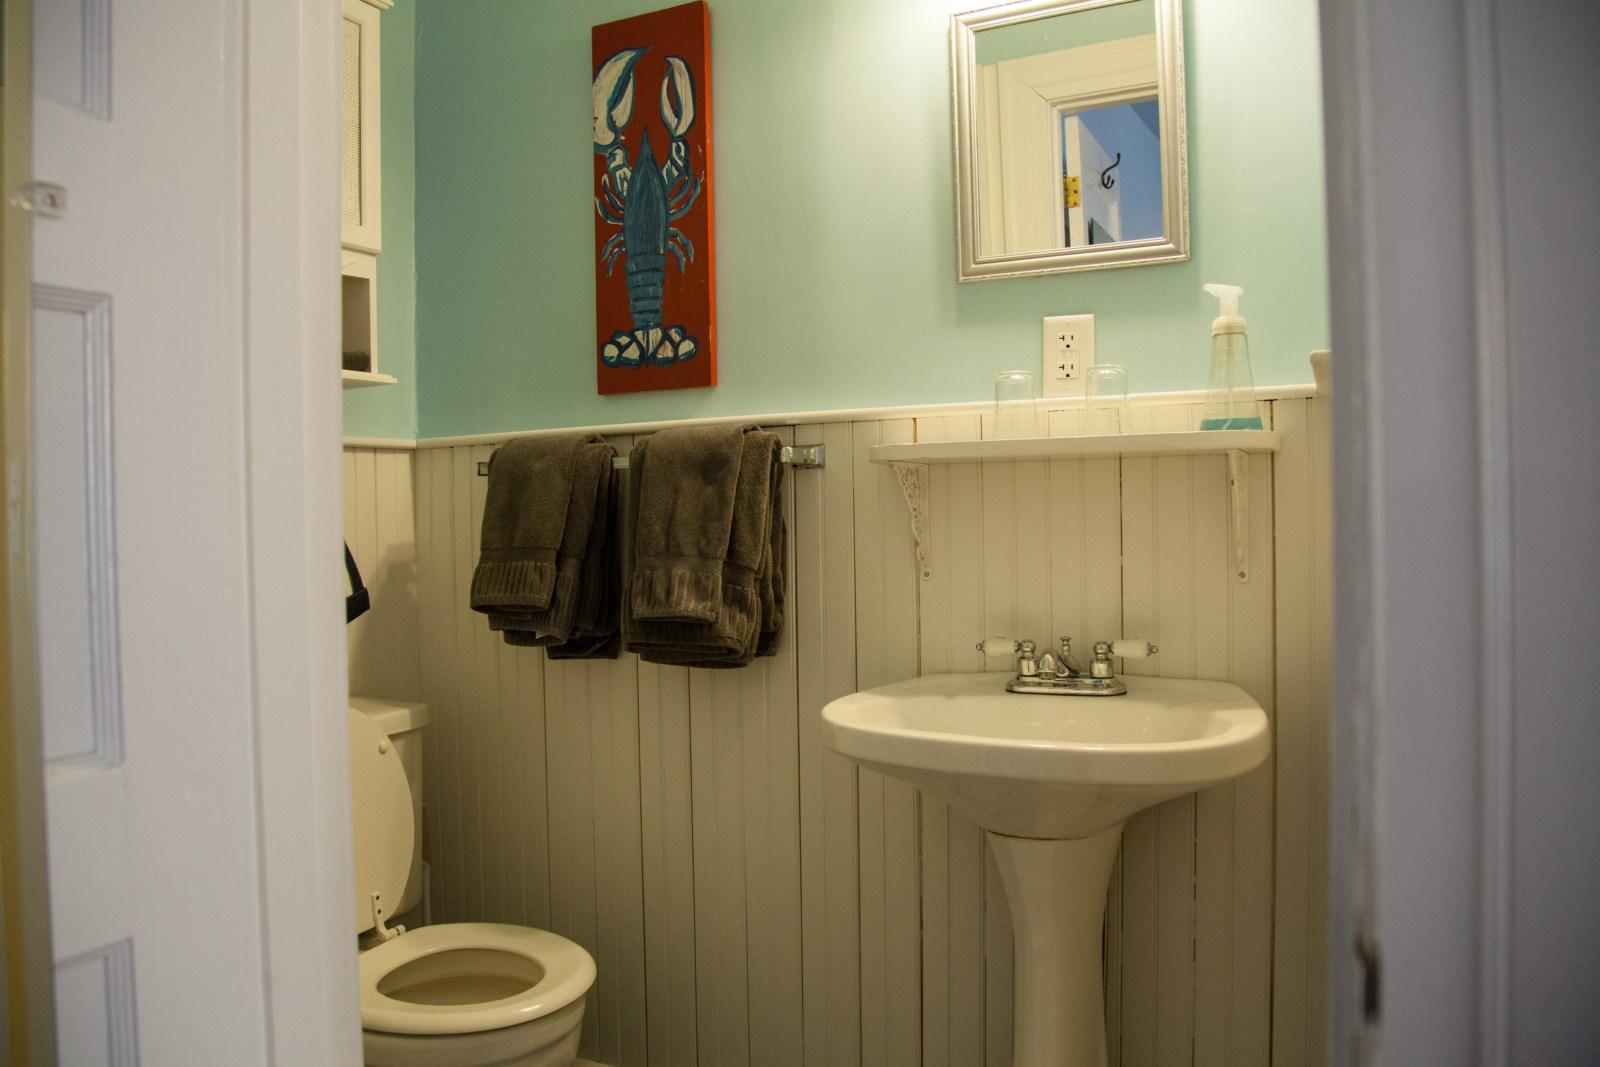 Phenomenal Canterbury Cottage Bed Breakfast Bar Harbor Maine Download Free Architecture Designs Photstoregrimeyleaguecom